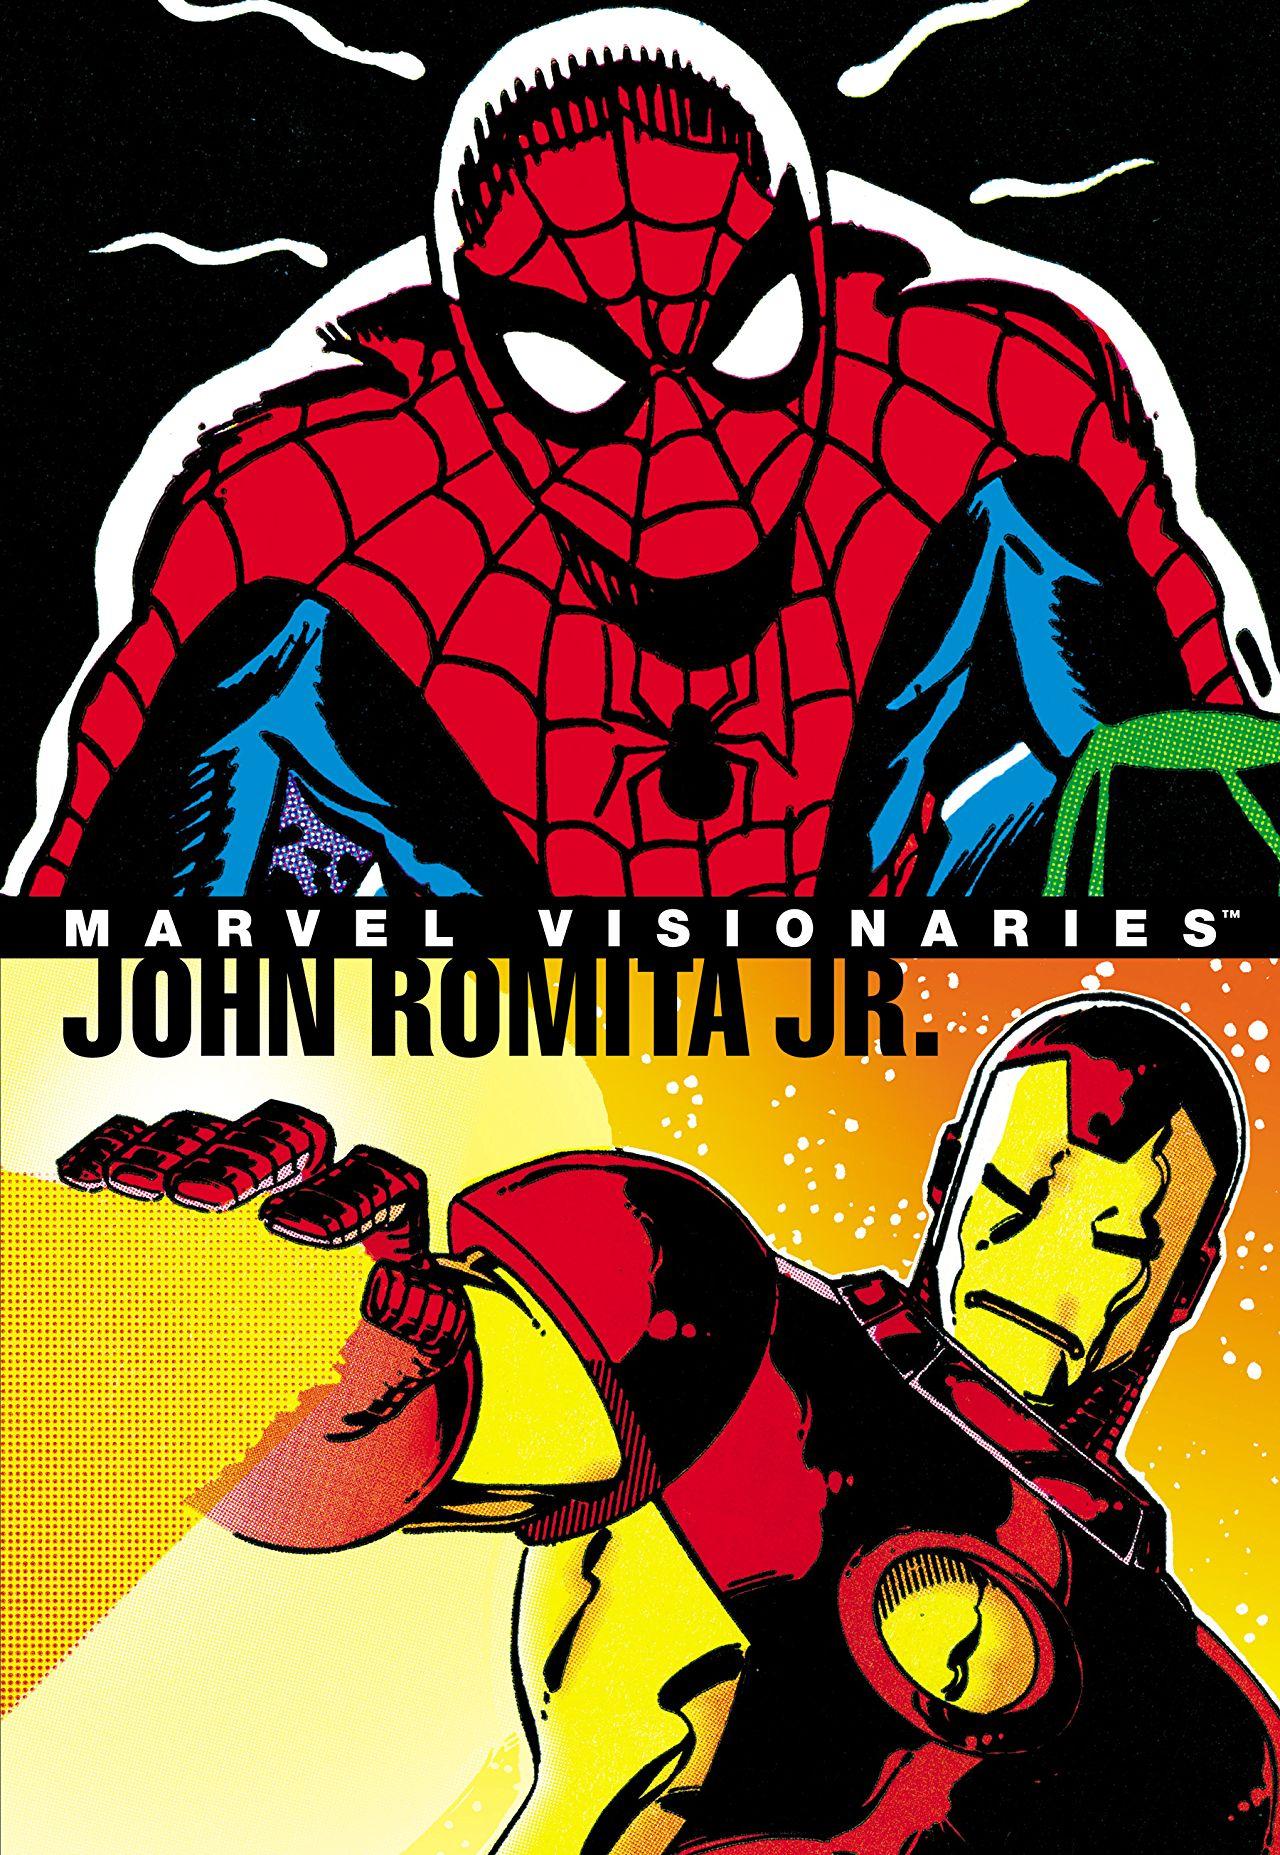 Marvel Visionaries: John Romita Jr. (Trade Paperback)